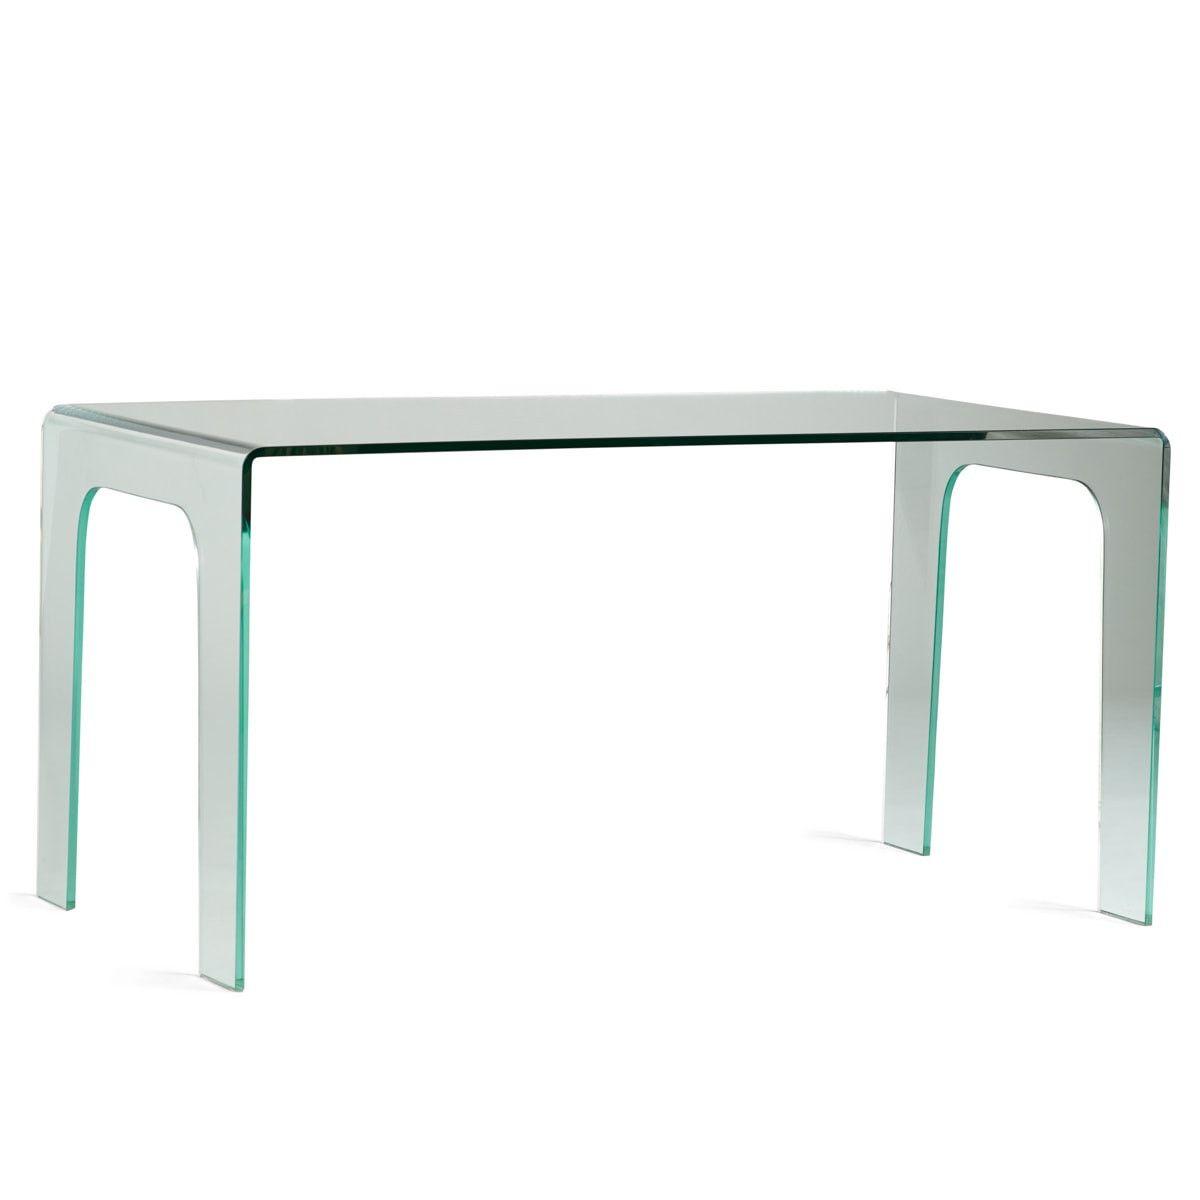 Minimalism Sleek Glass Desk Modern Home Office Clear Desk